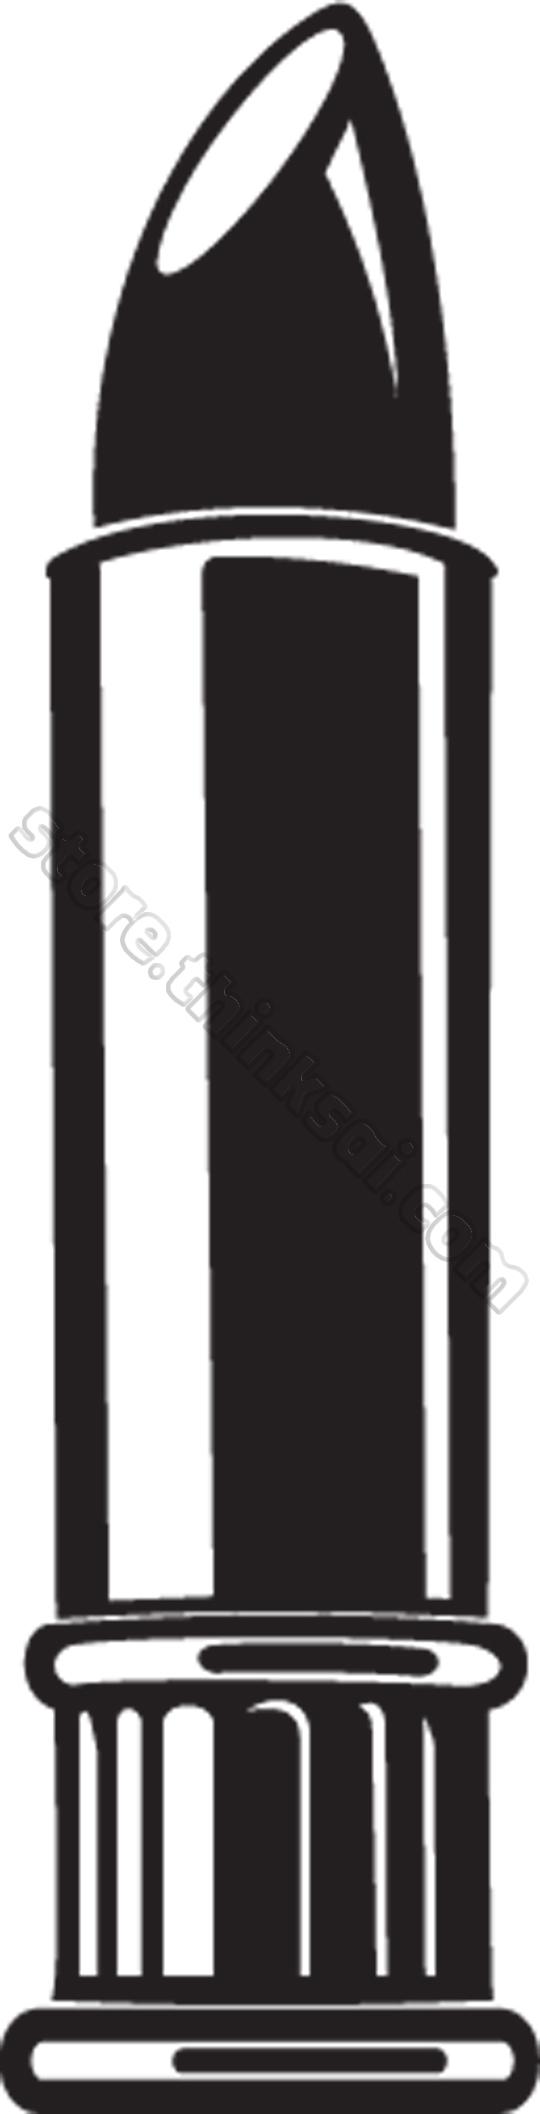 540x2114 Lipstick Clipart Black And White